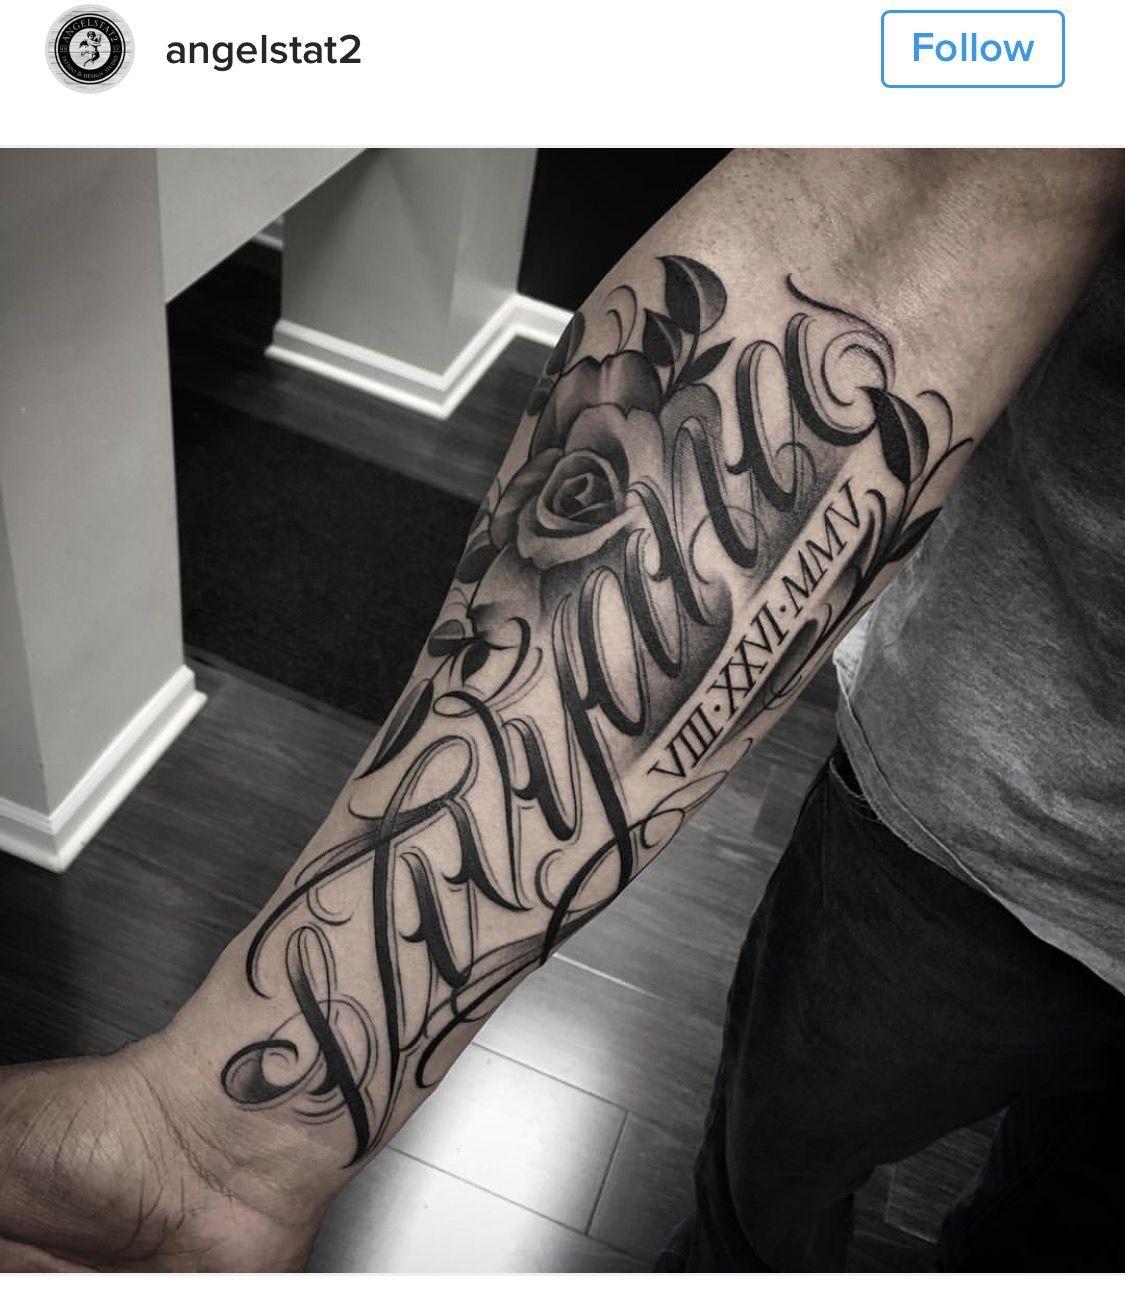 Mens Forearm Tattoos Pinterest Zeus Mens Tattoo On The Forearm In 2020 Forearm Sleeve Tattoos Forearm Name Tattoos Forearm Tattoos